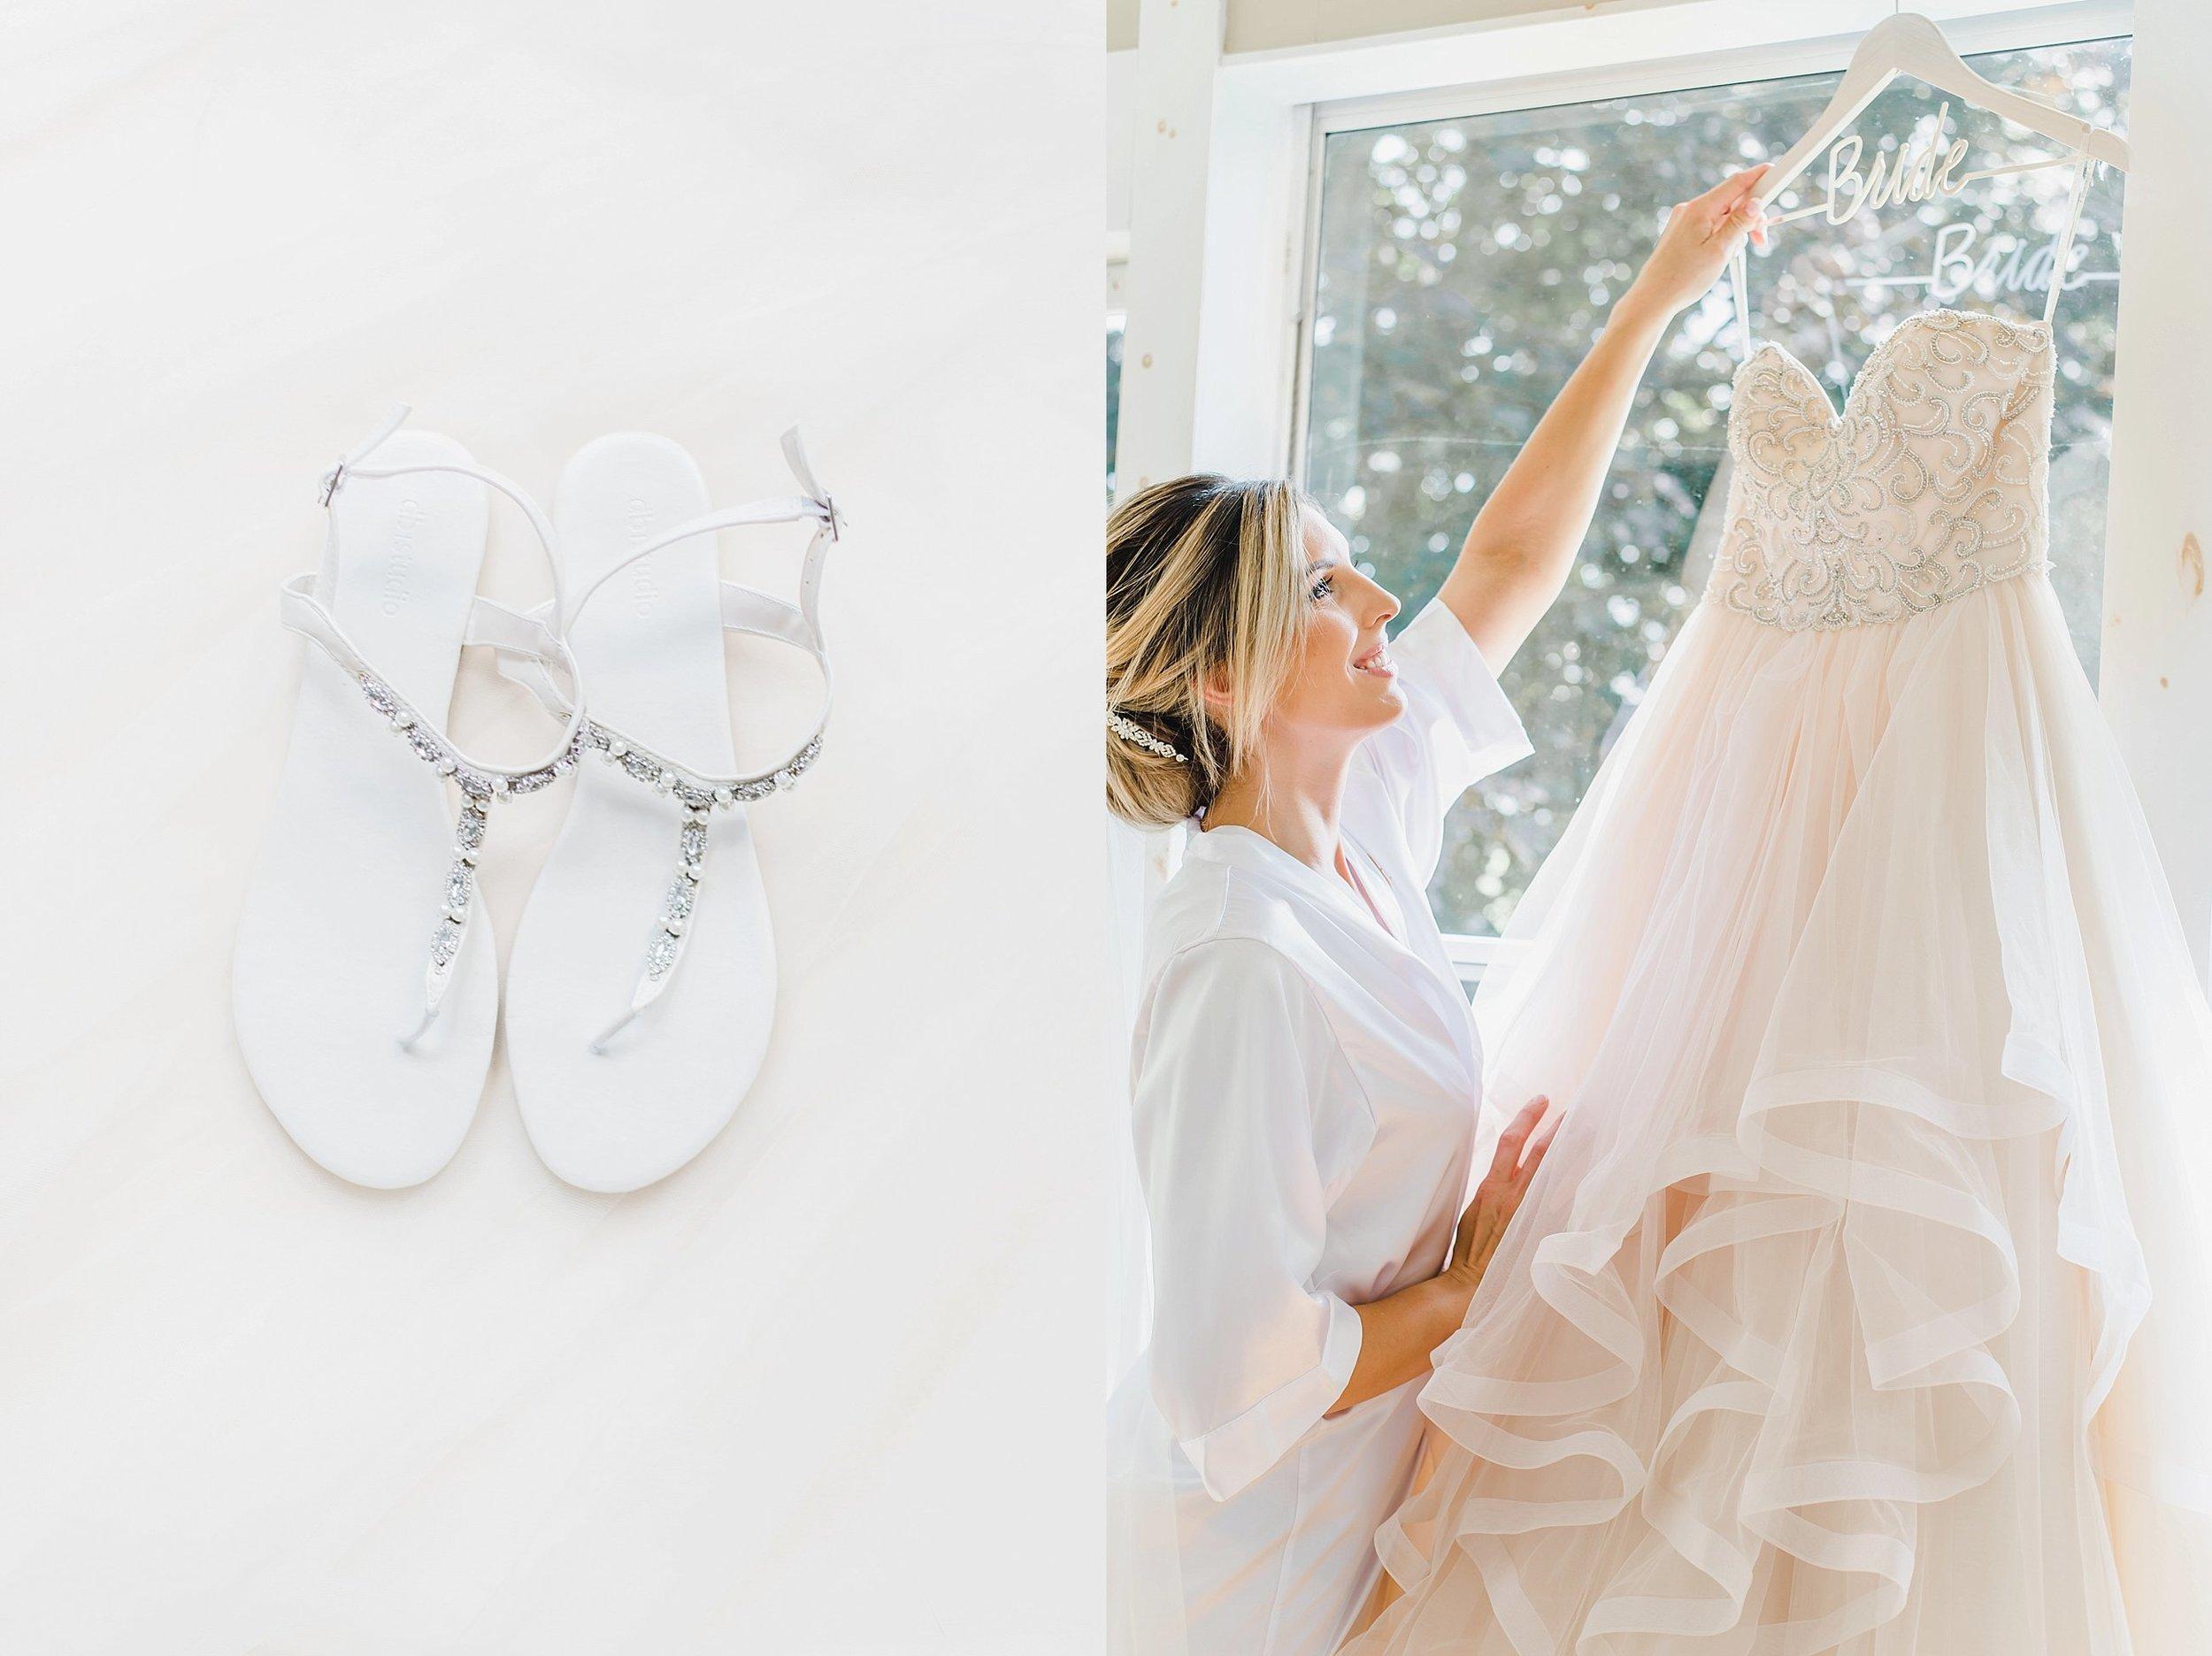 light airy indie fine art ottawa wedding photographer | Ali and Batoul Photography_0136.jpg